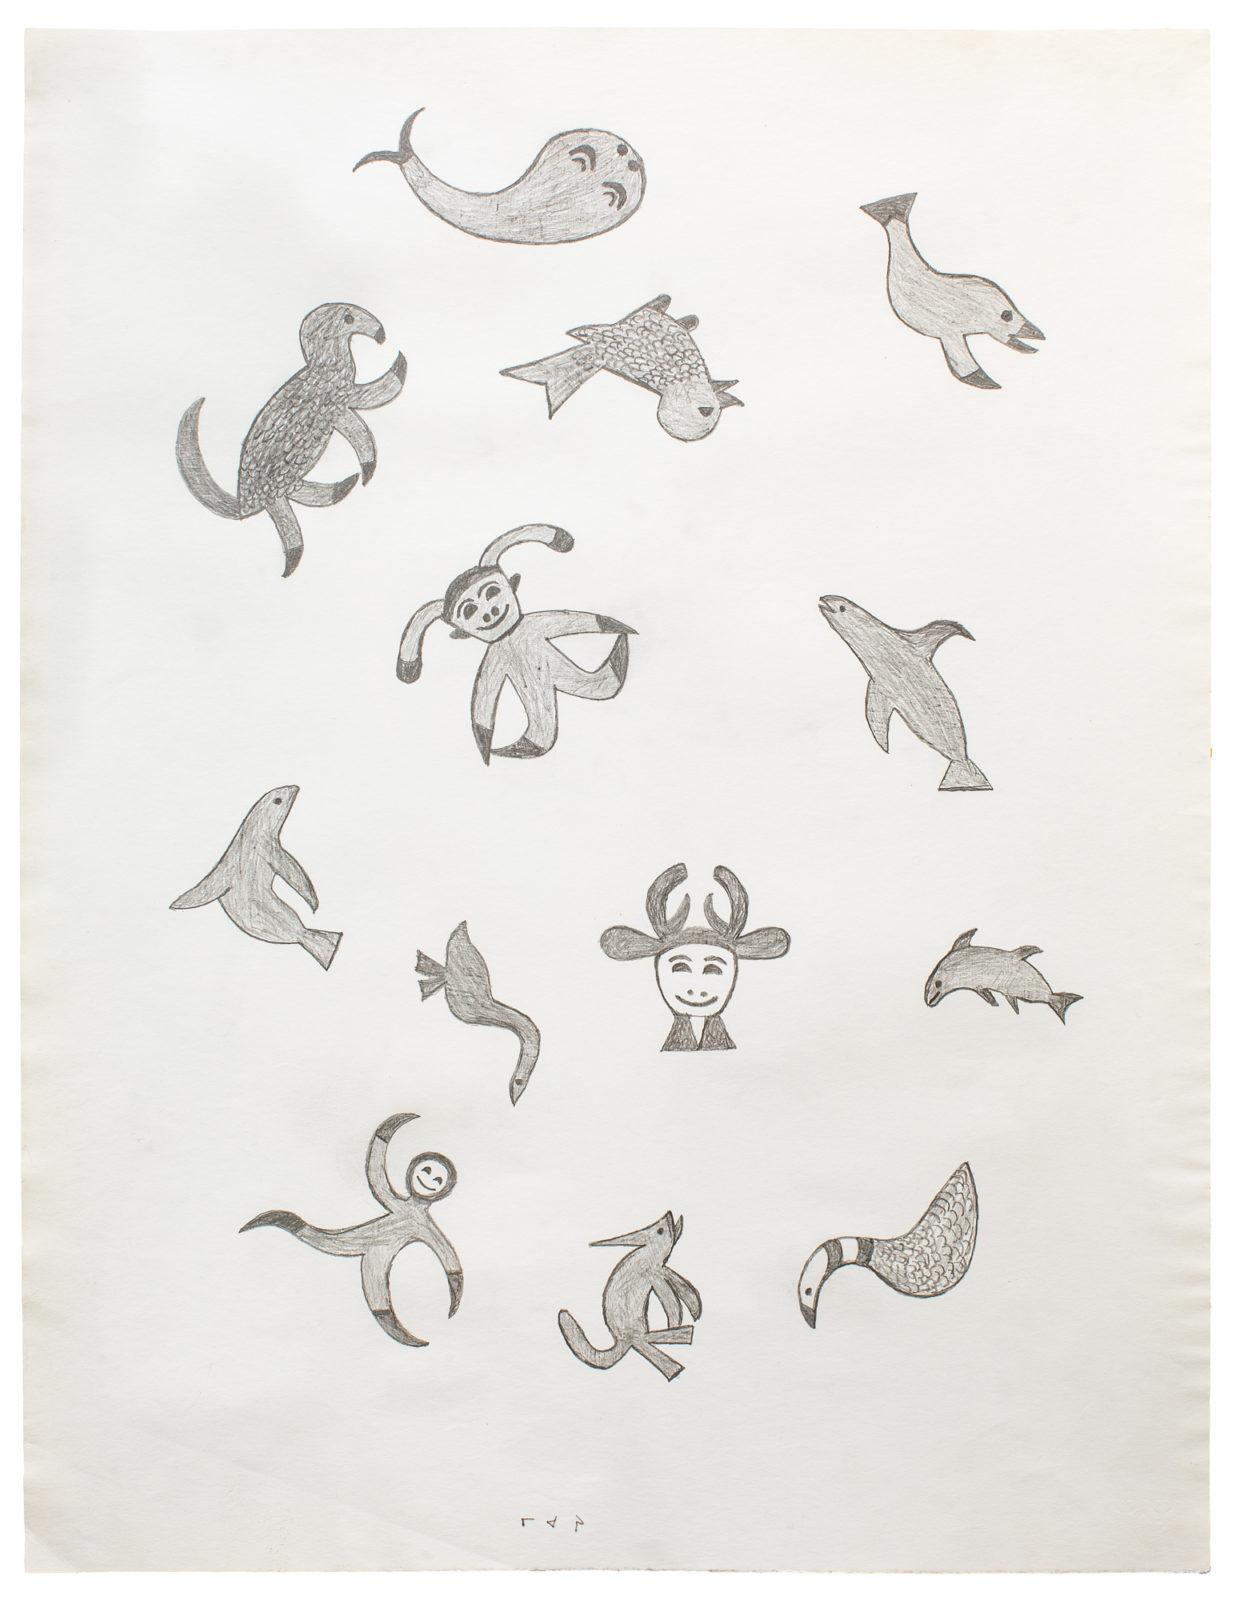 Mary Igiu - untitled (arrangement of creatures)